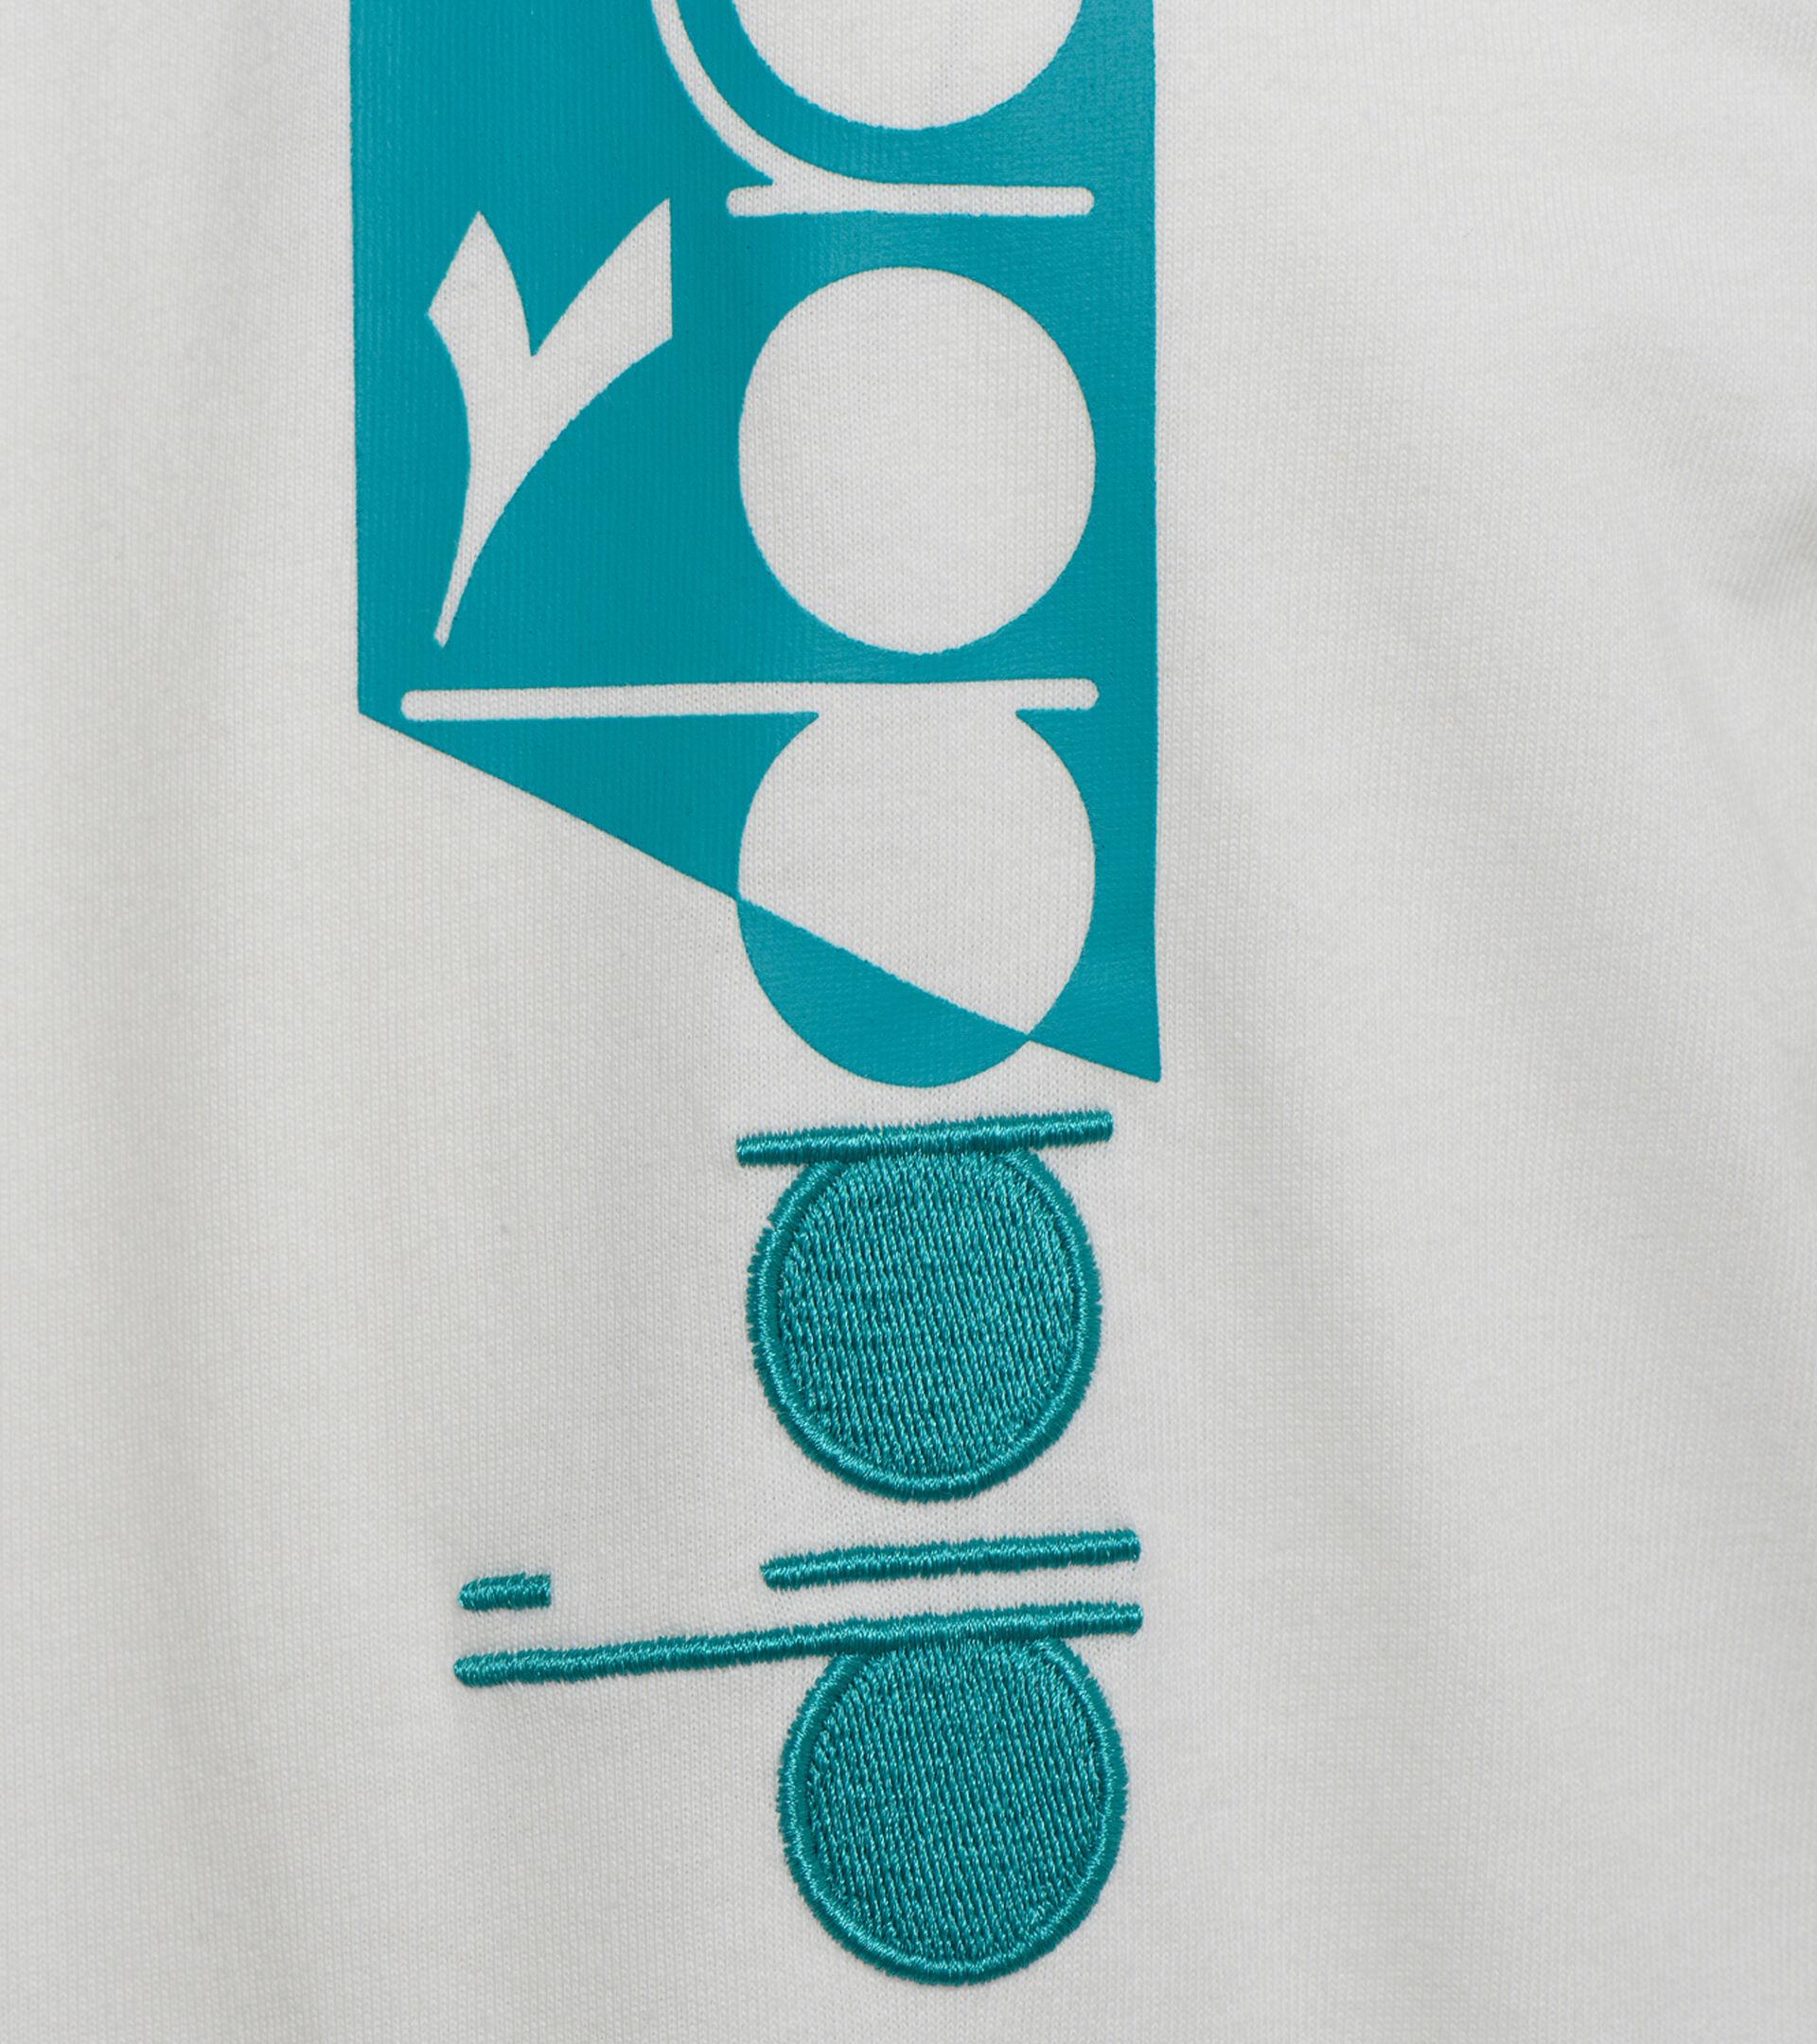 Apparel Sportswear UOMO T-SHIRT SS ICON BIANCO LATTE/VERDE ACQUA Diadora